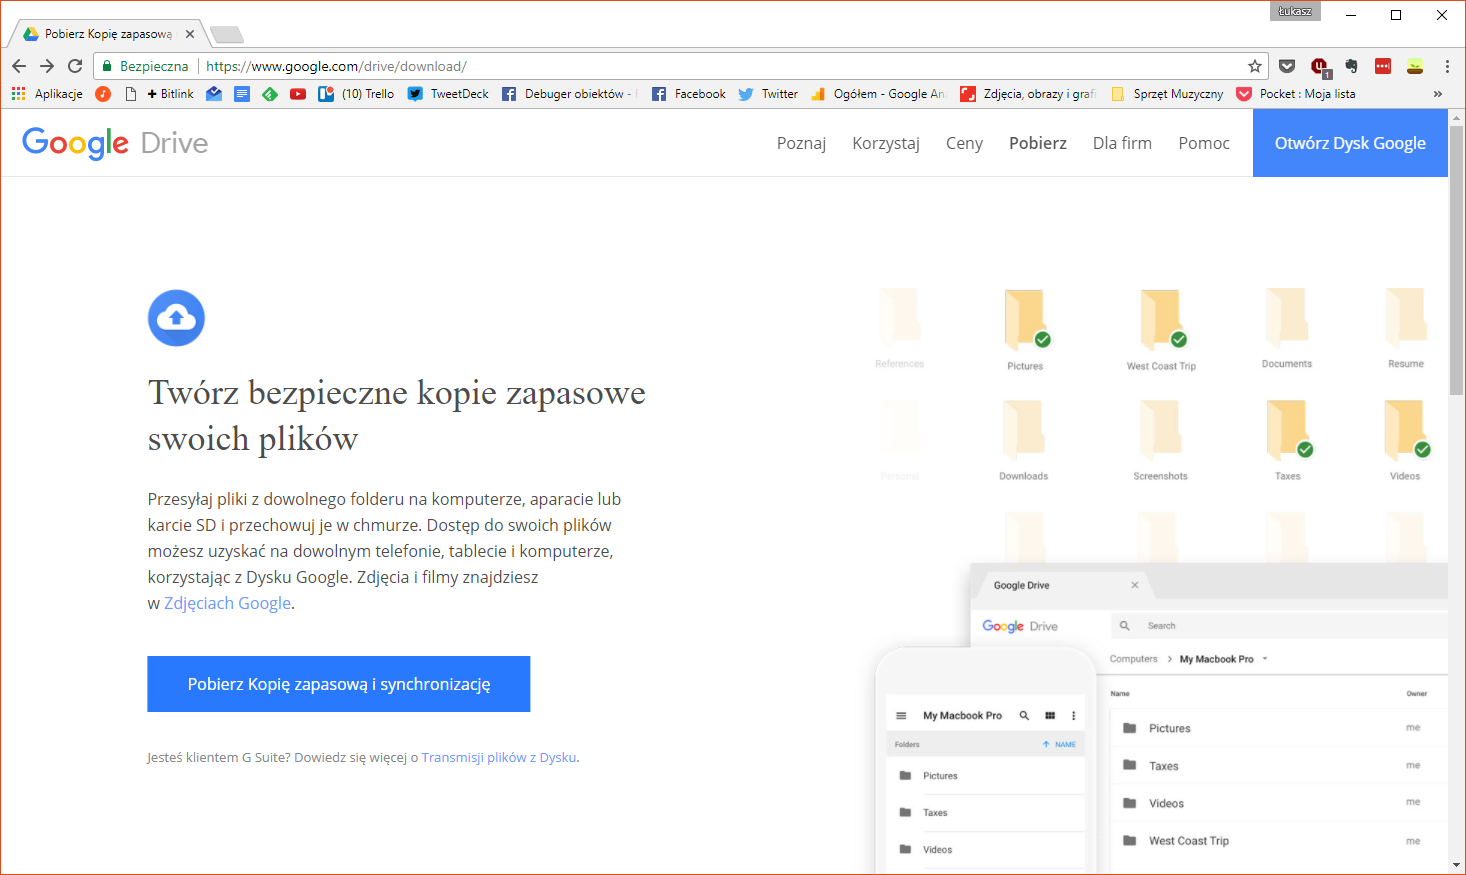 Pid n, pesun a import kontakt - Google Support